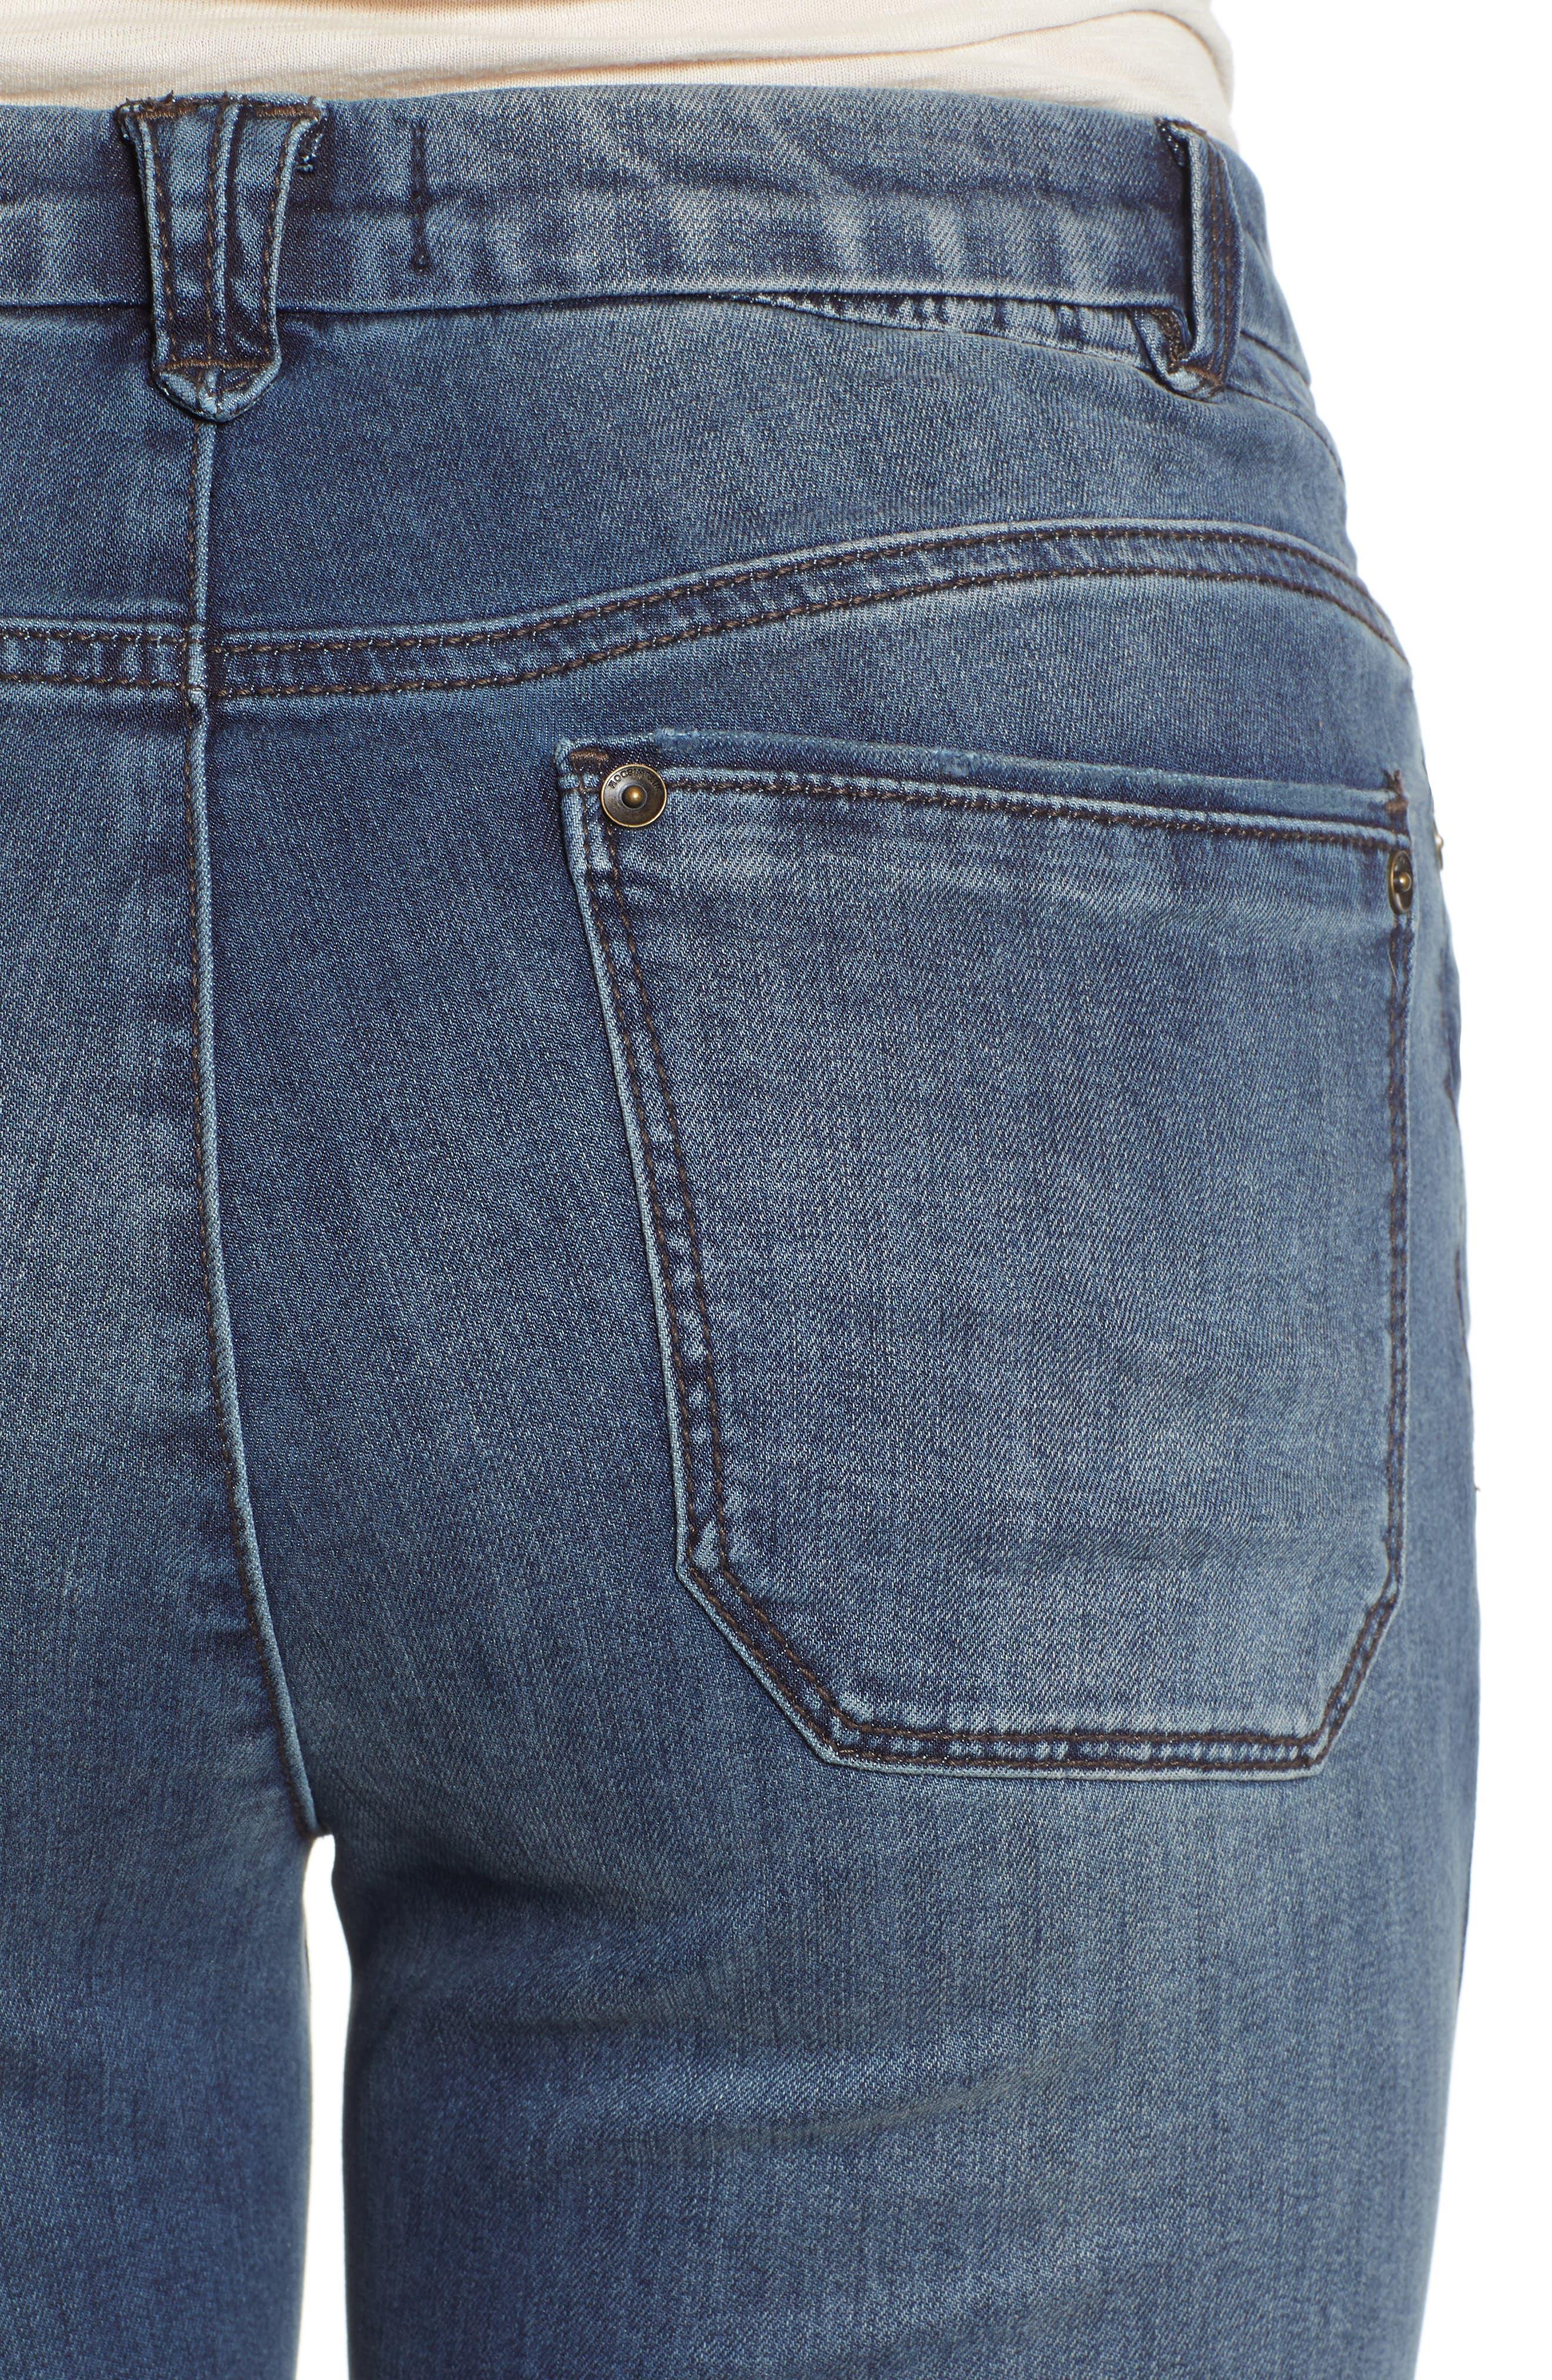 Ab-Solution High Waist Skinny Jeans,                             Alternate thumbnail 4, color,                             420